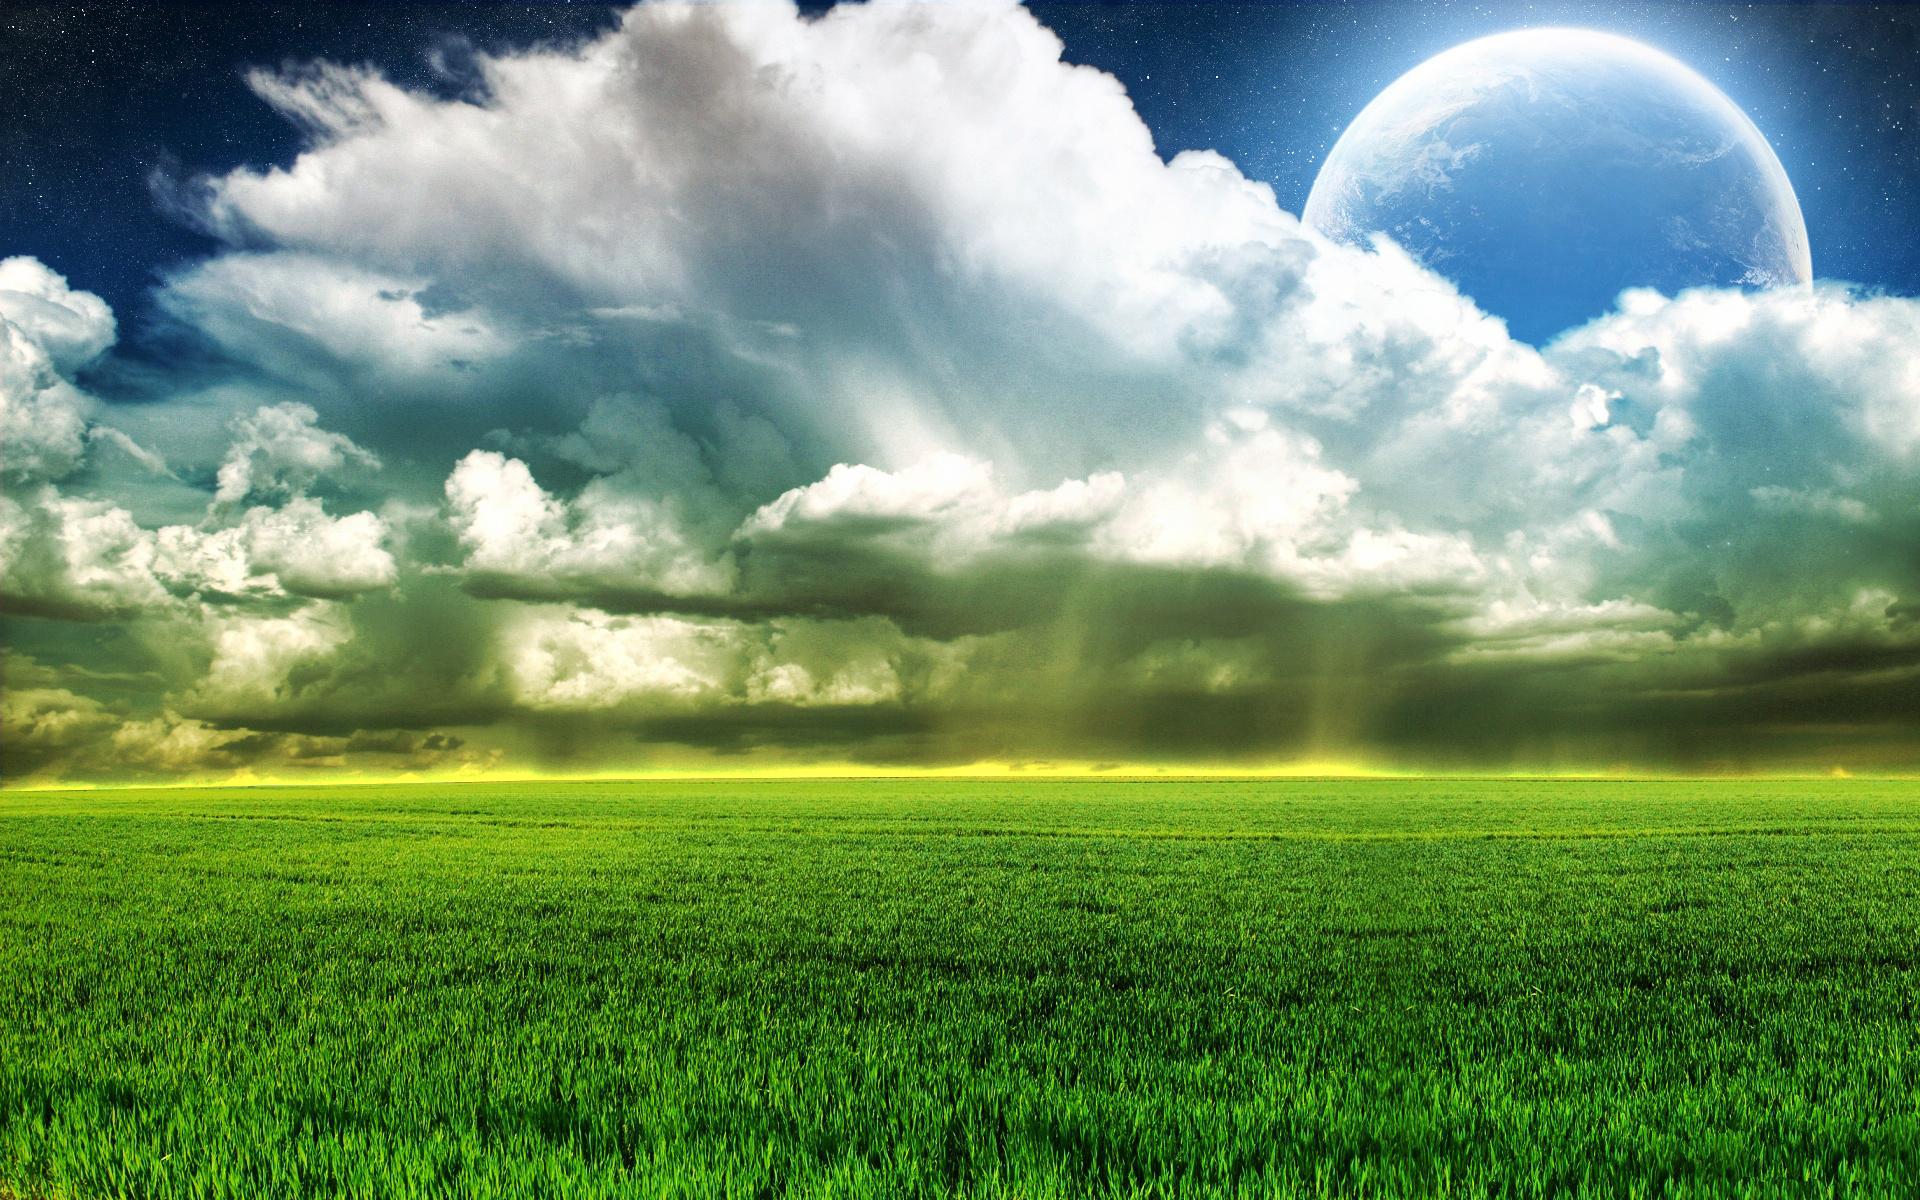 Пейзажи небо облака луна поле трава